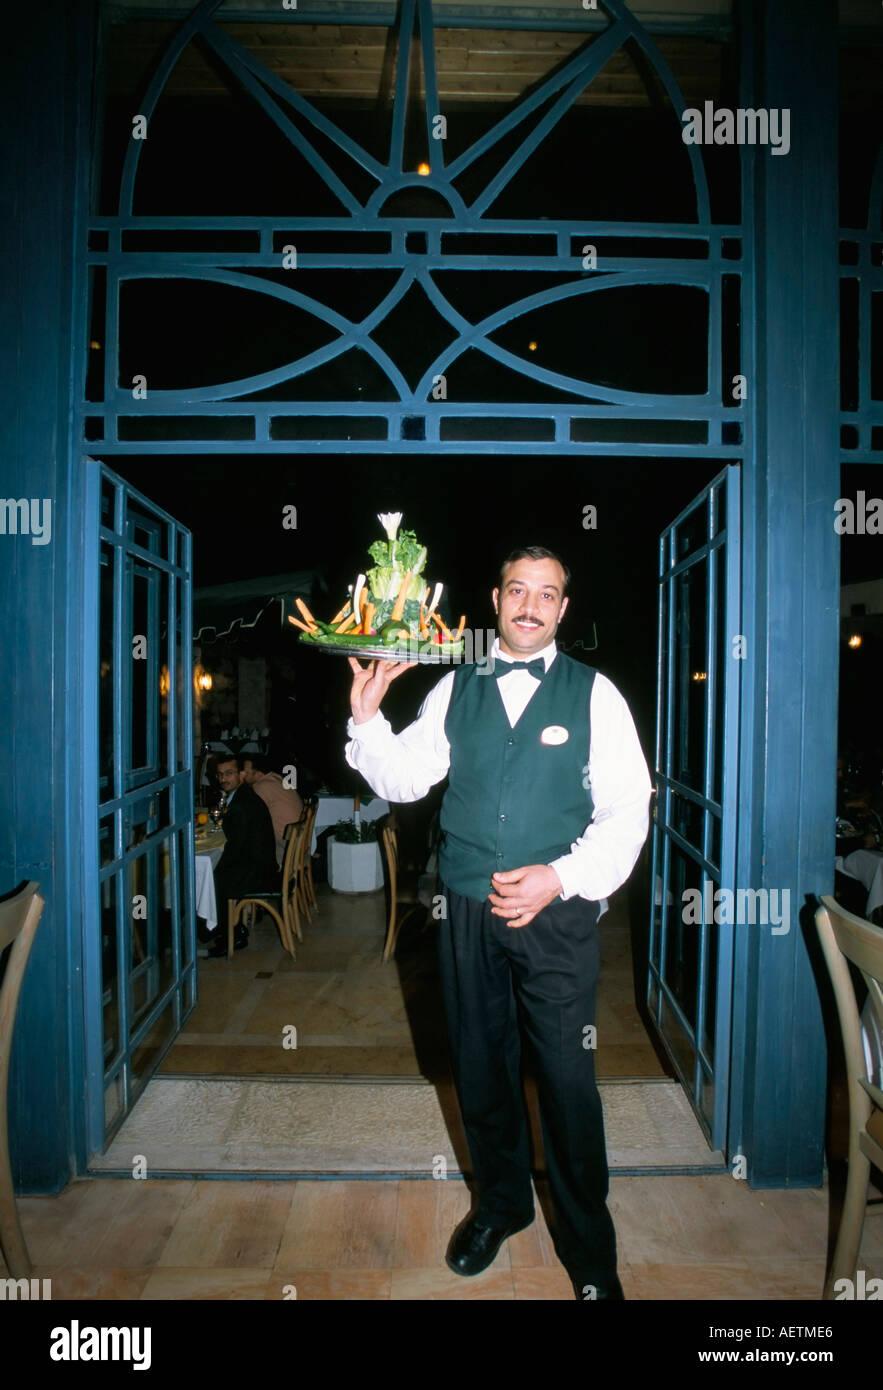 Waiter with signature salad at Fakhr El Din restaurant Amman Jordan Middle East - Stock Image